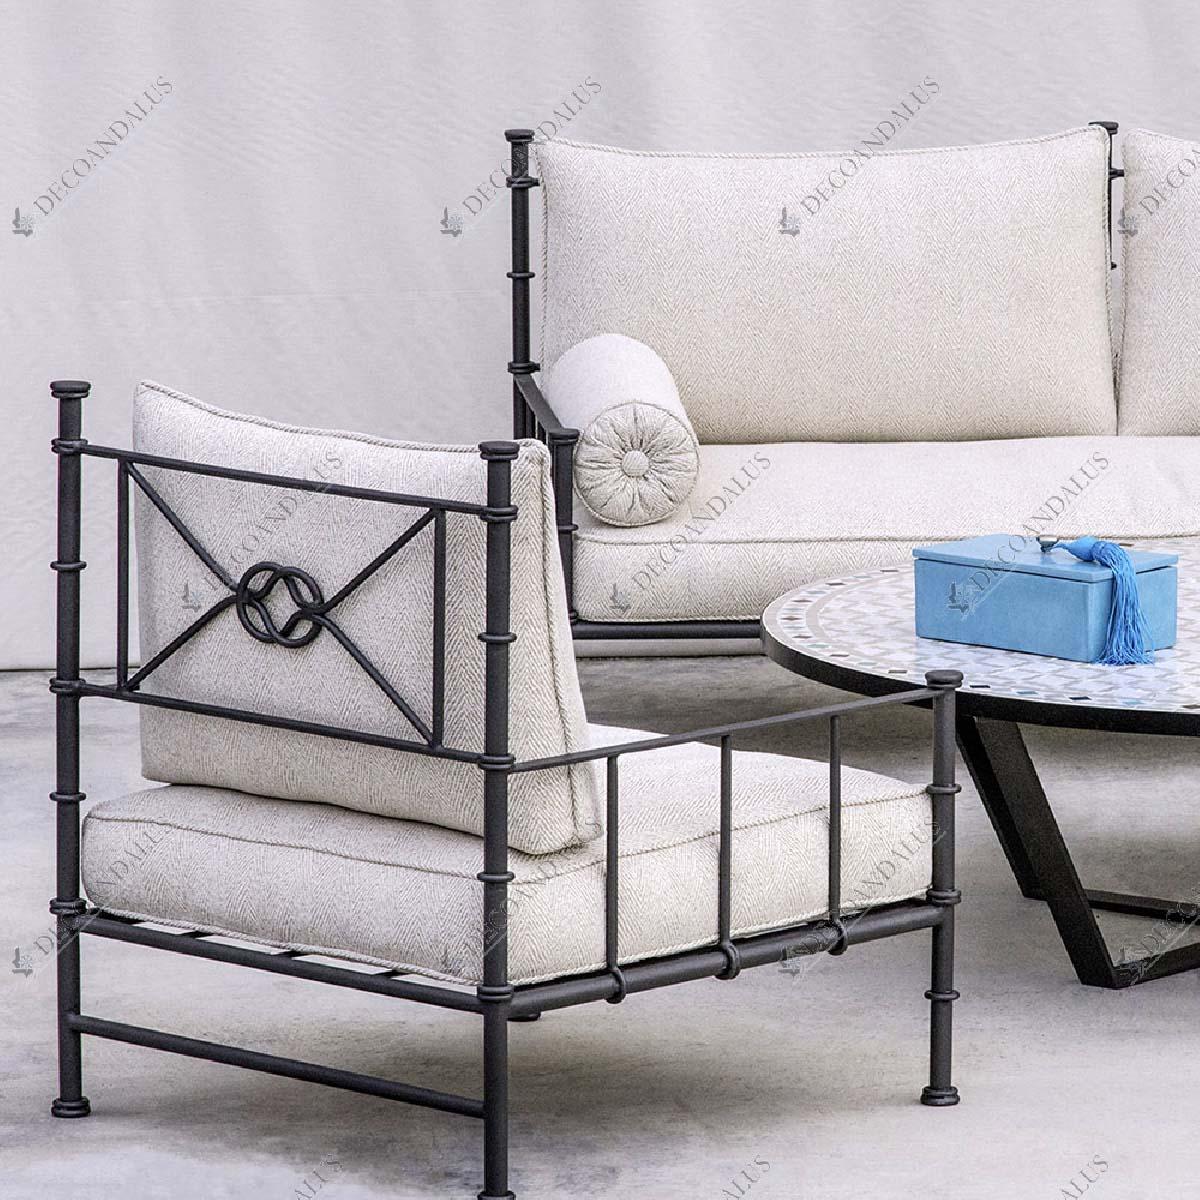 cama sofa forja apartment length sofá si so 33 decoandalus